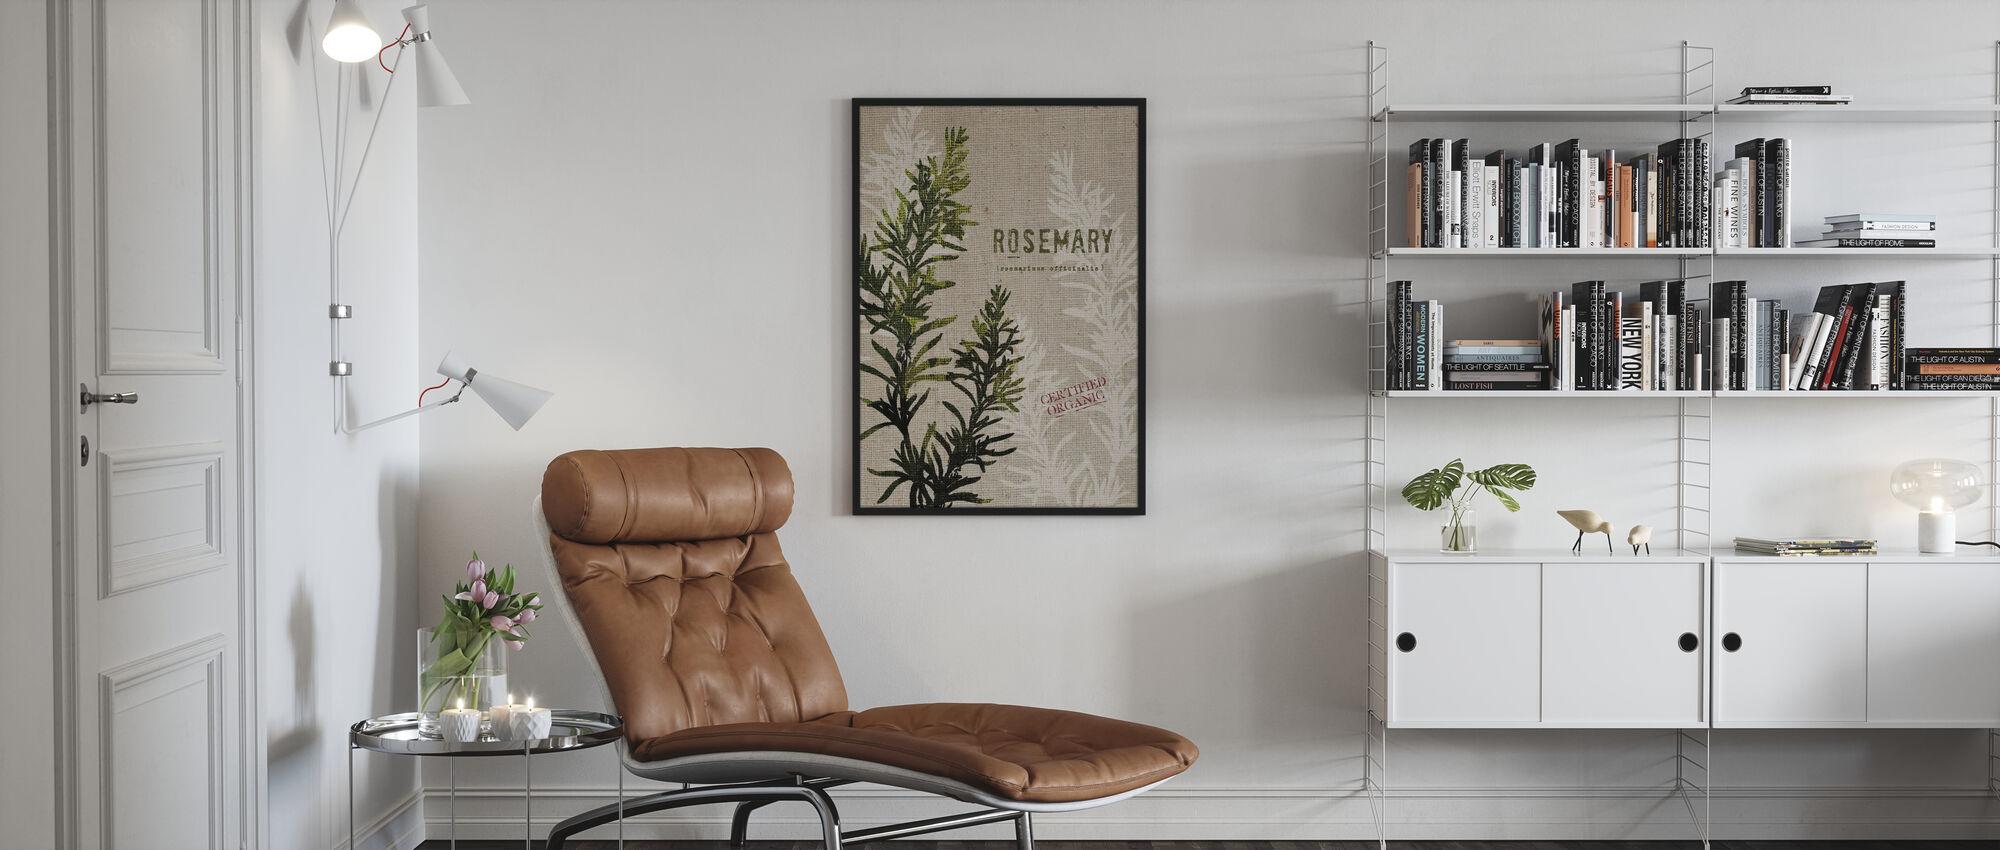 Organic Rosemary - Poster - Living Room